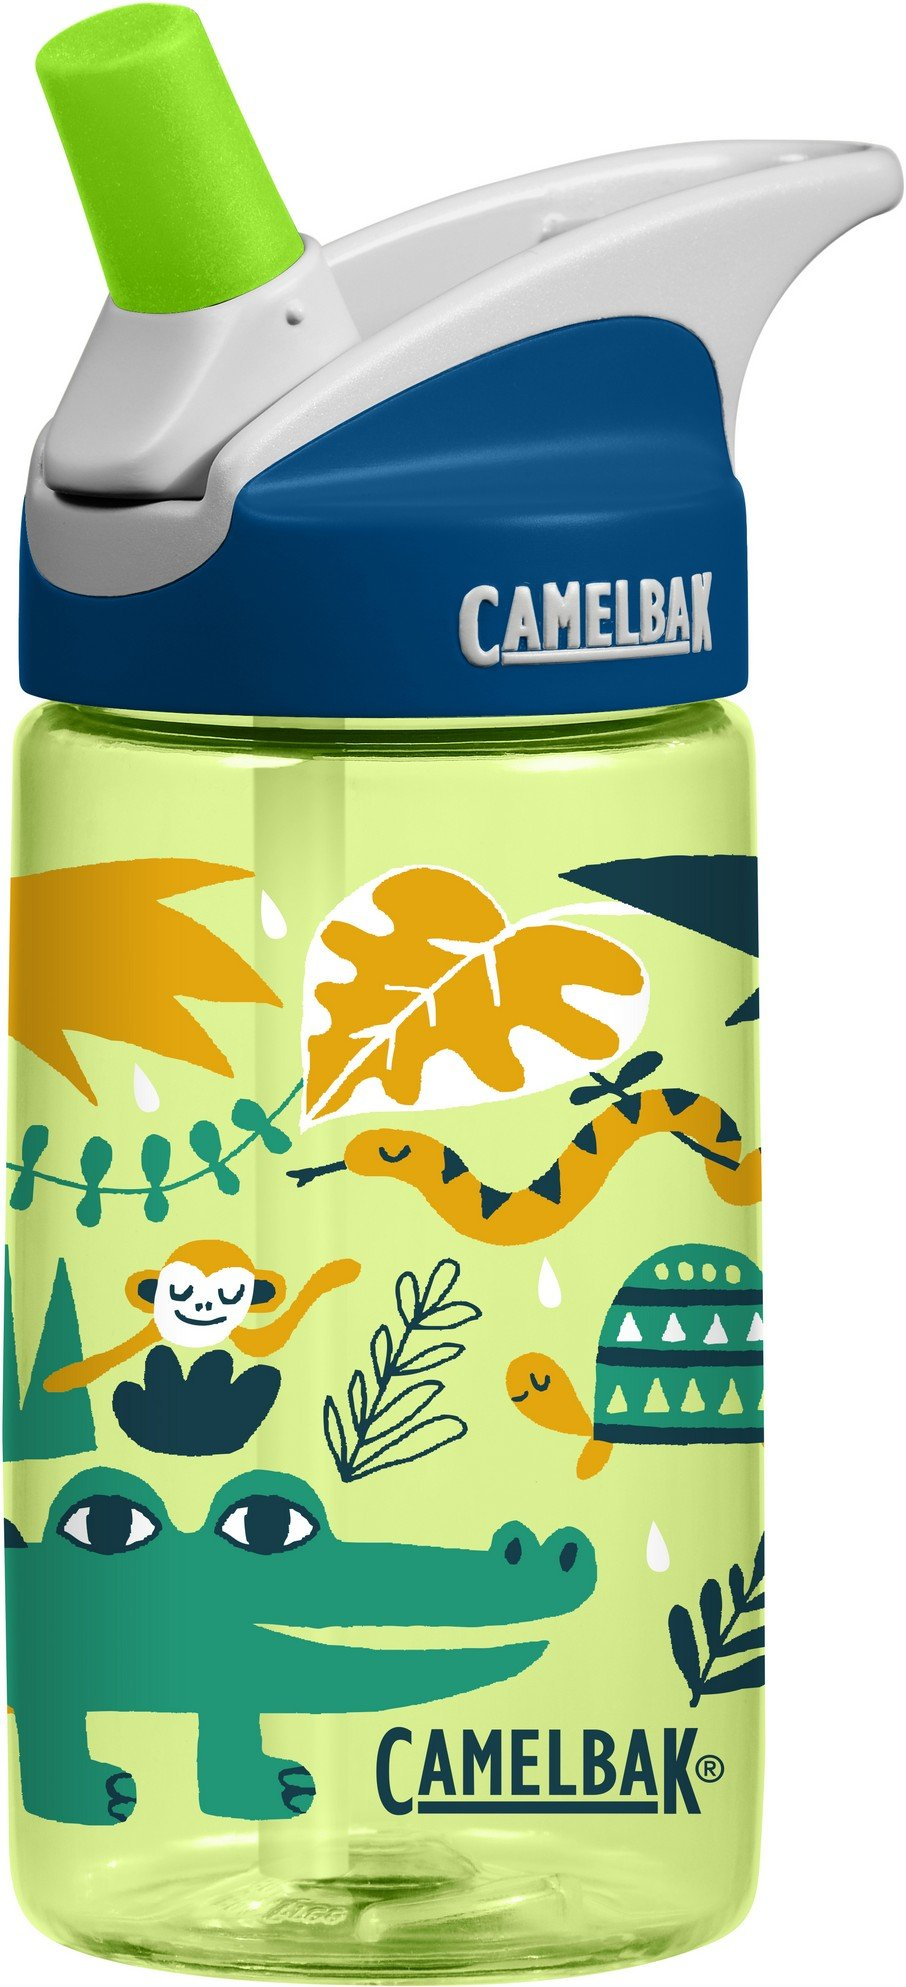 CamelBak Eddy Kids Water Bottle, Jungle Animals.4 L